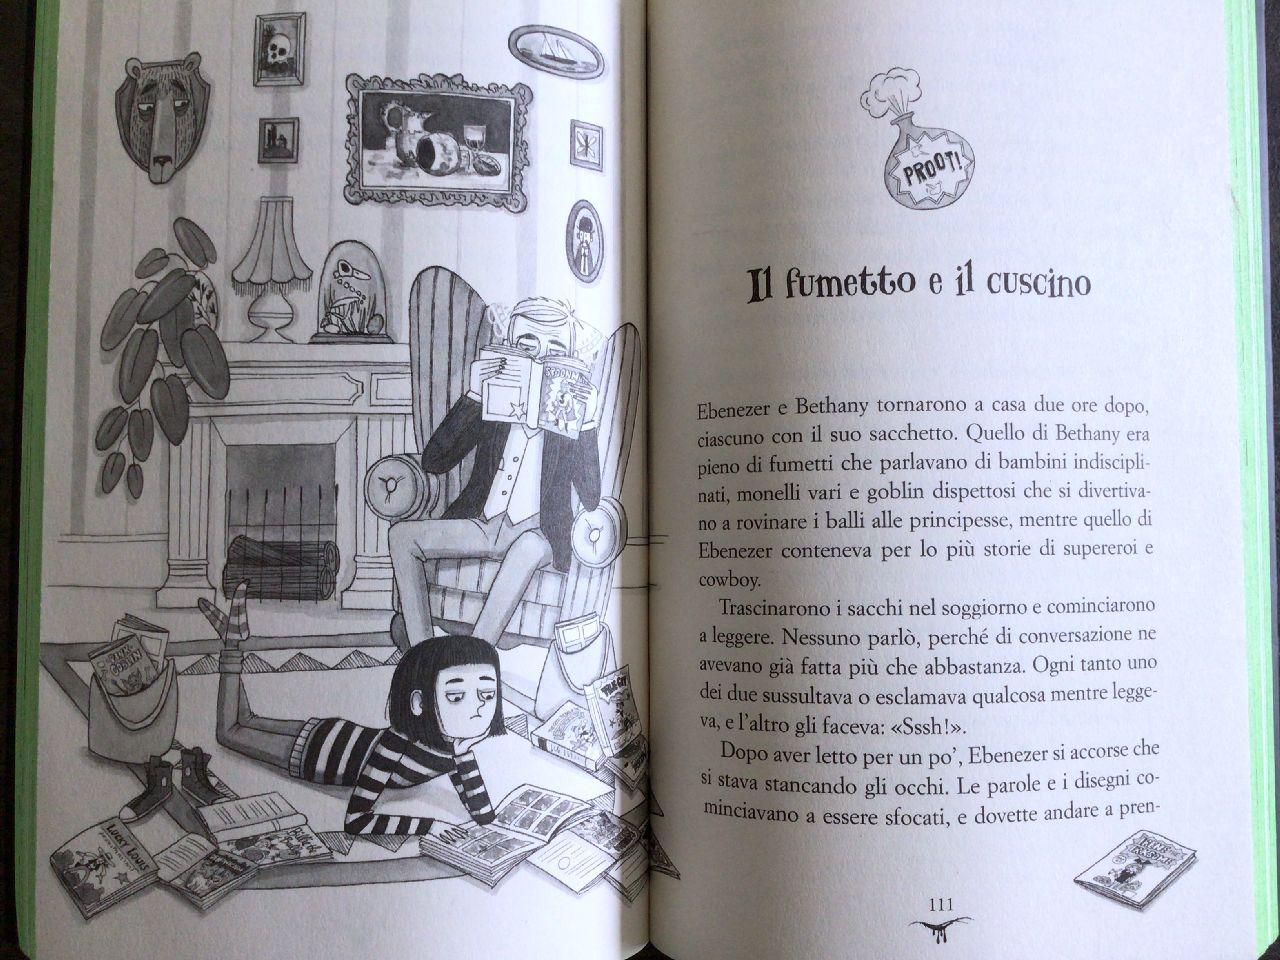 Jack Meggitt-Phillips, Bethany e la Bestia, Rizzoli